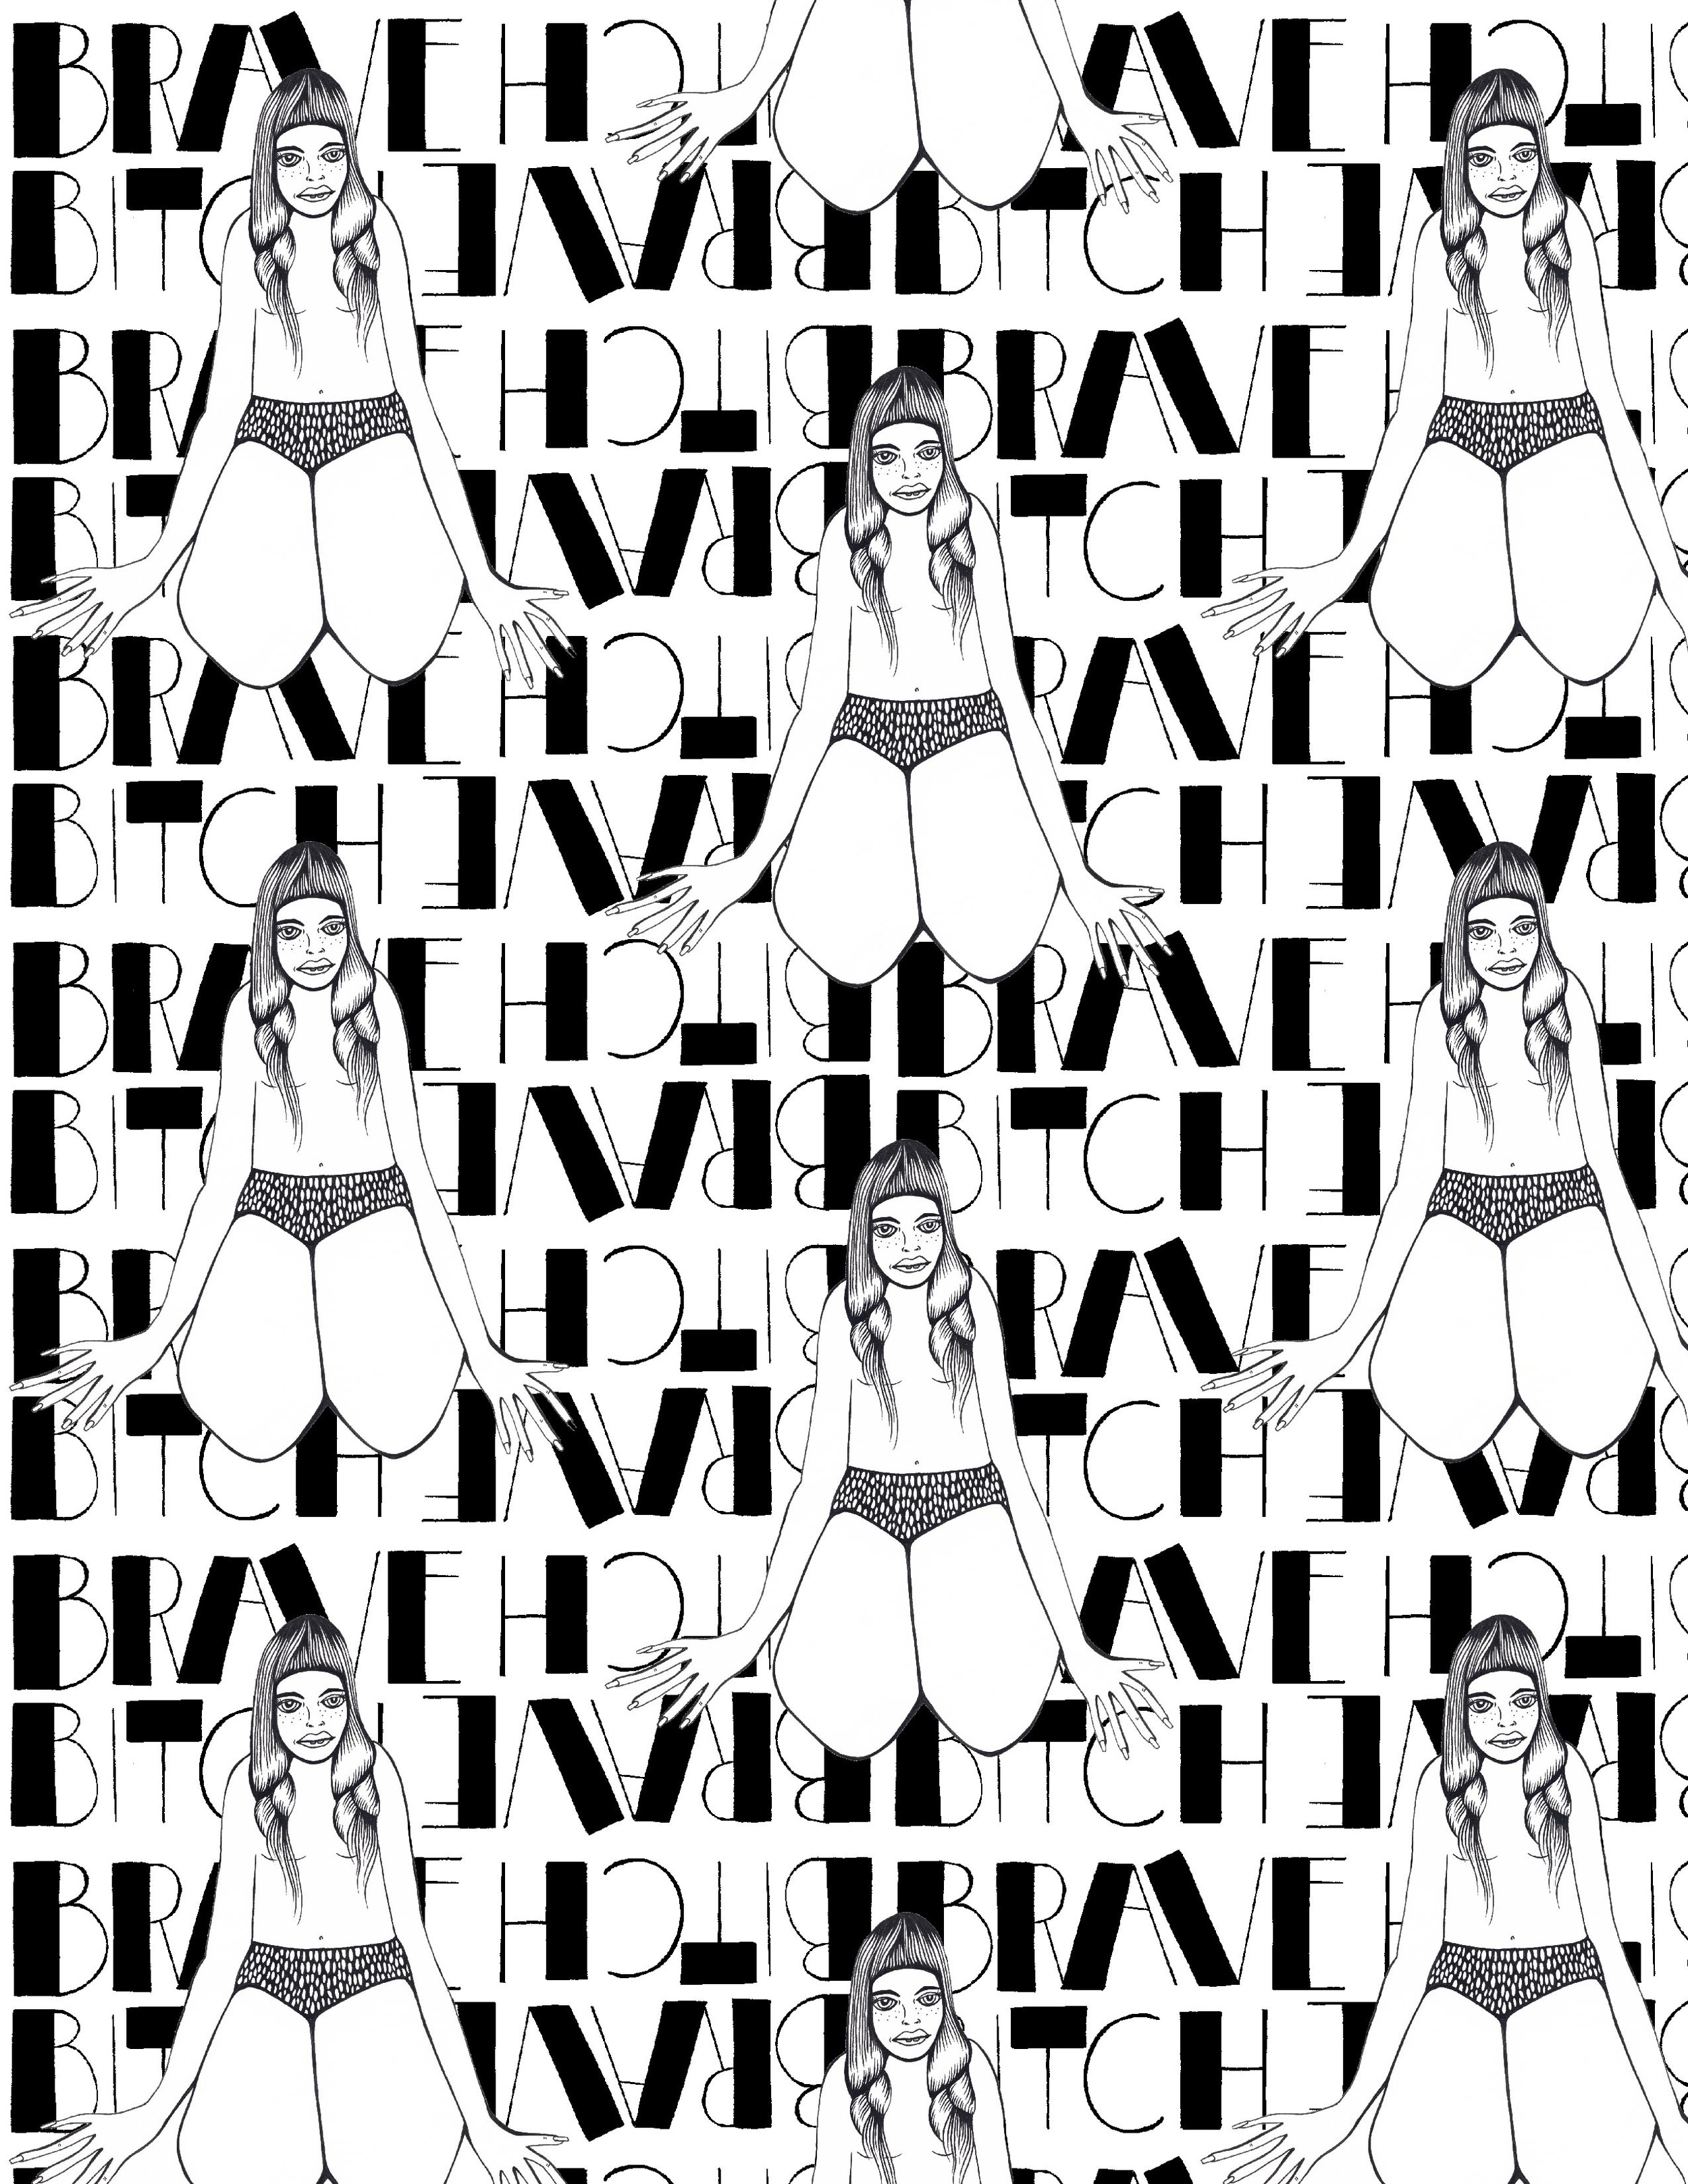 Brave Bitch Pattern.jpg